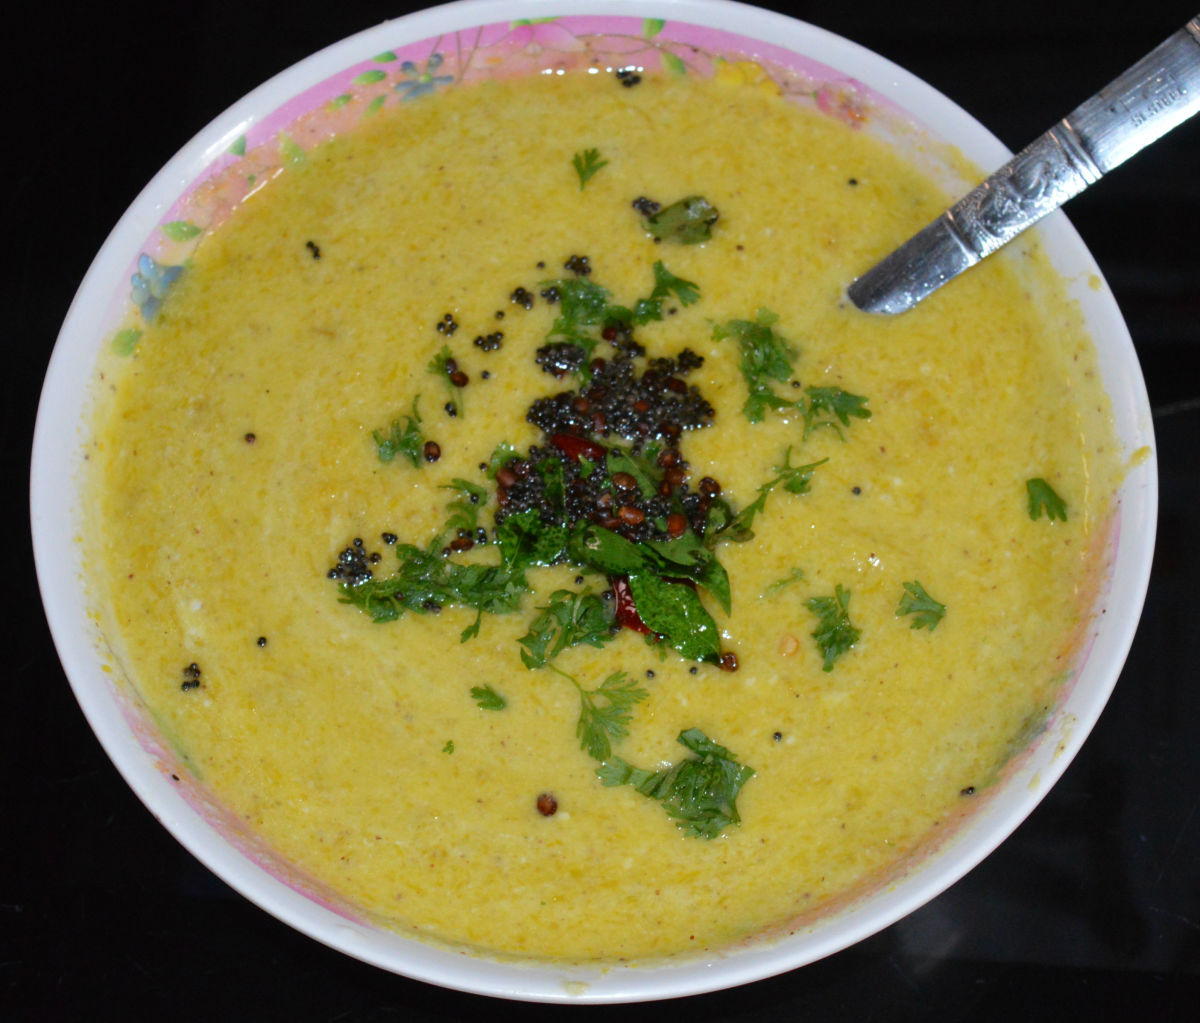 How to Make Yellow Pumpkin Raita or Yogurt-Based Side Dish